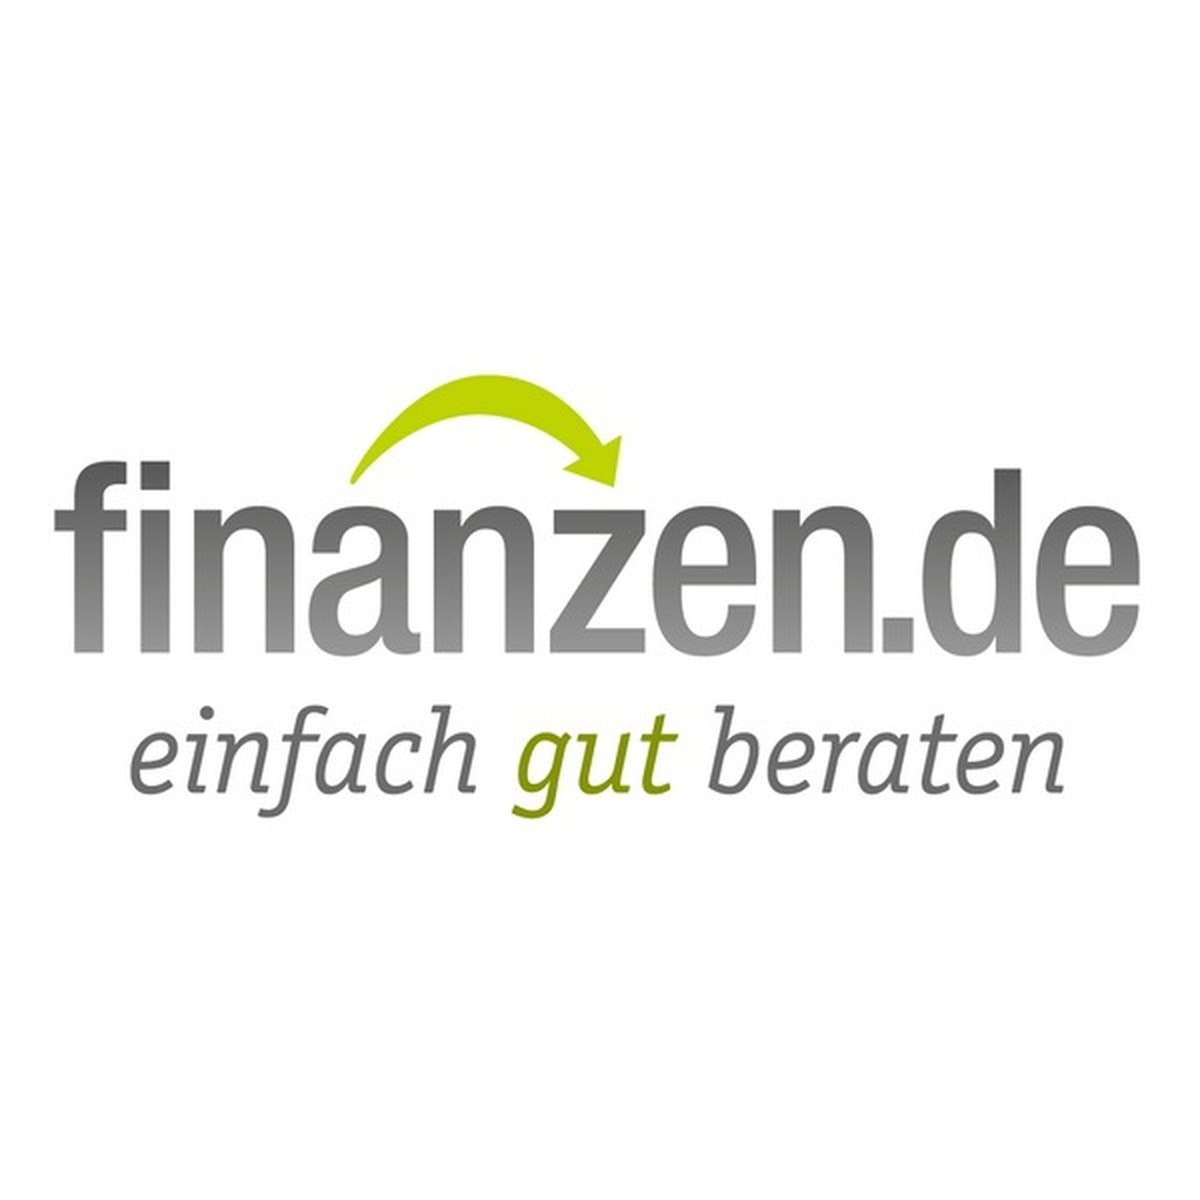 finanzen.de GmbH